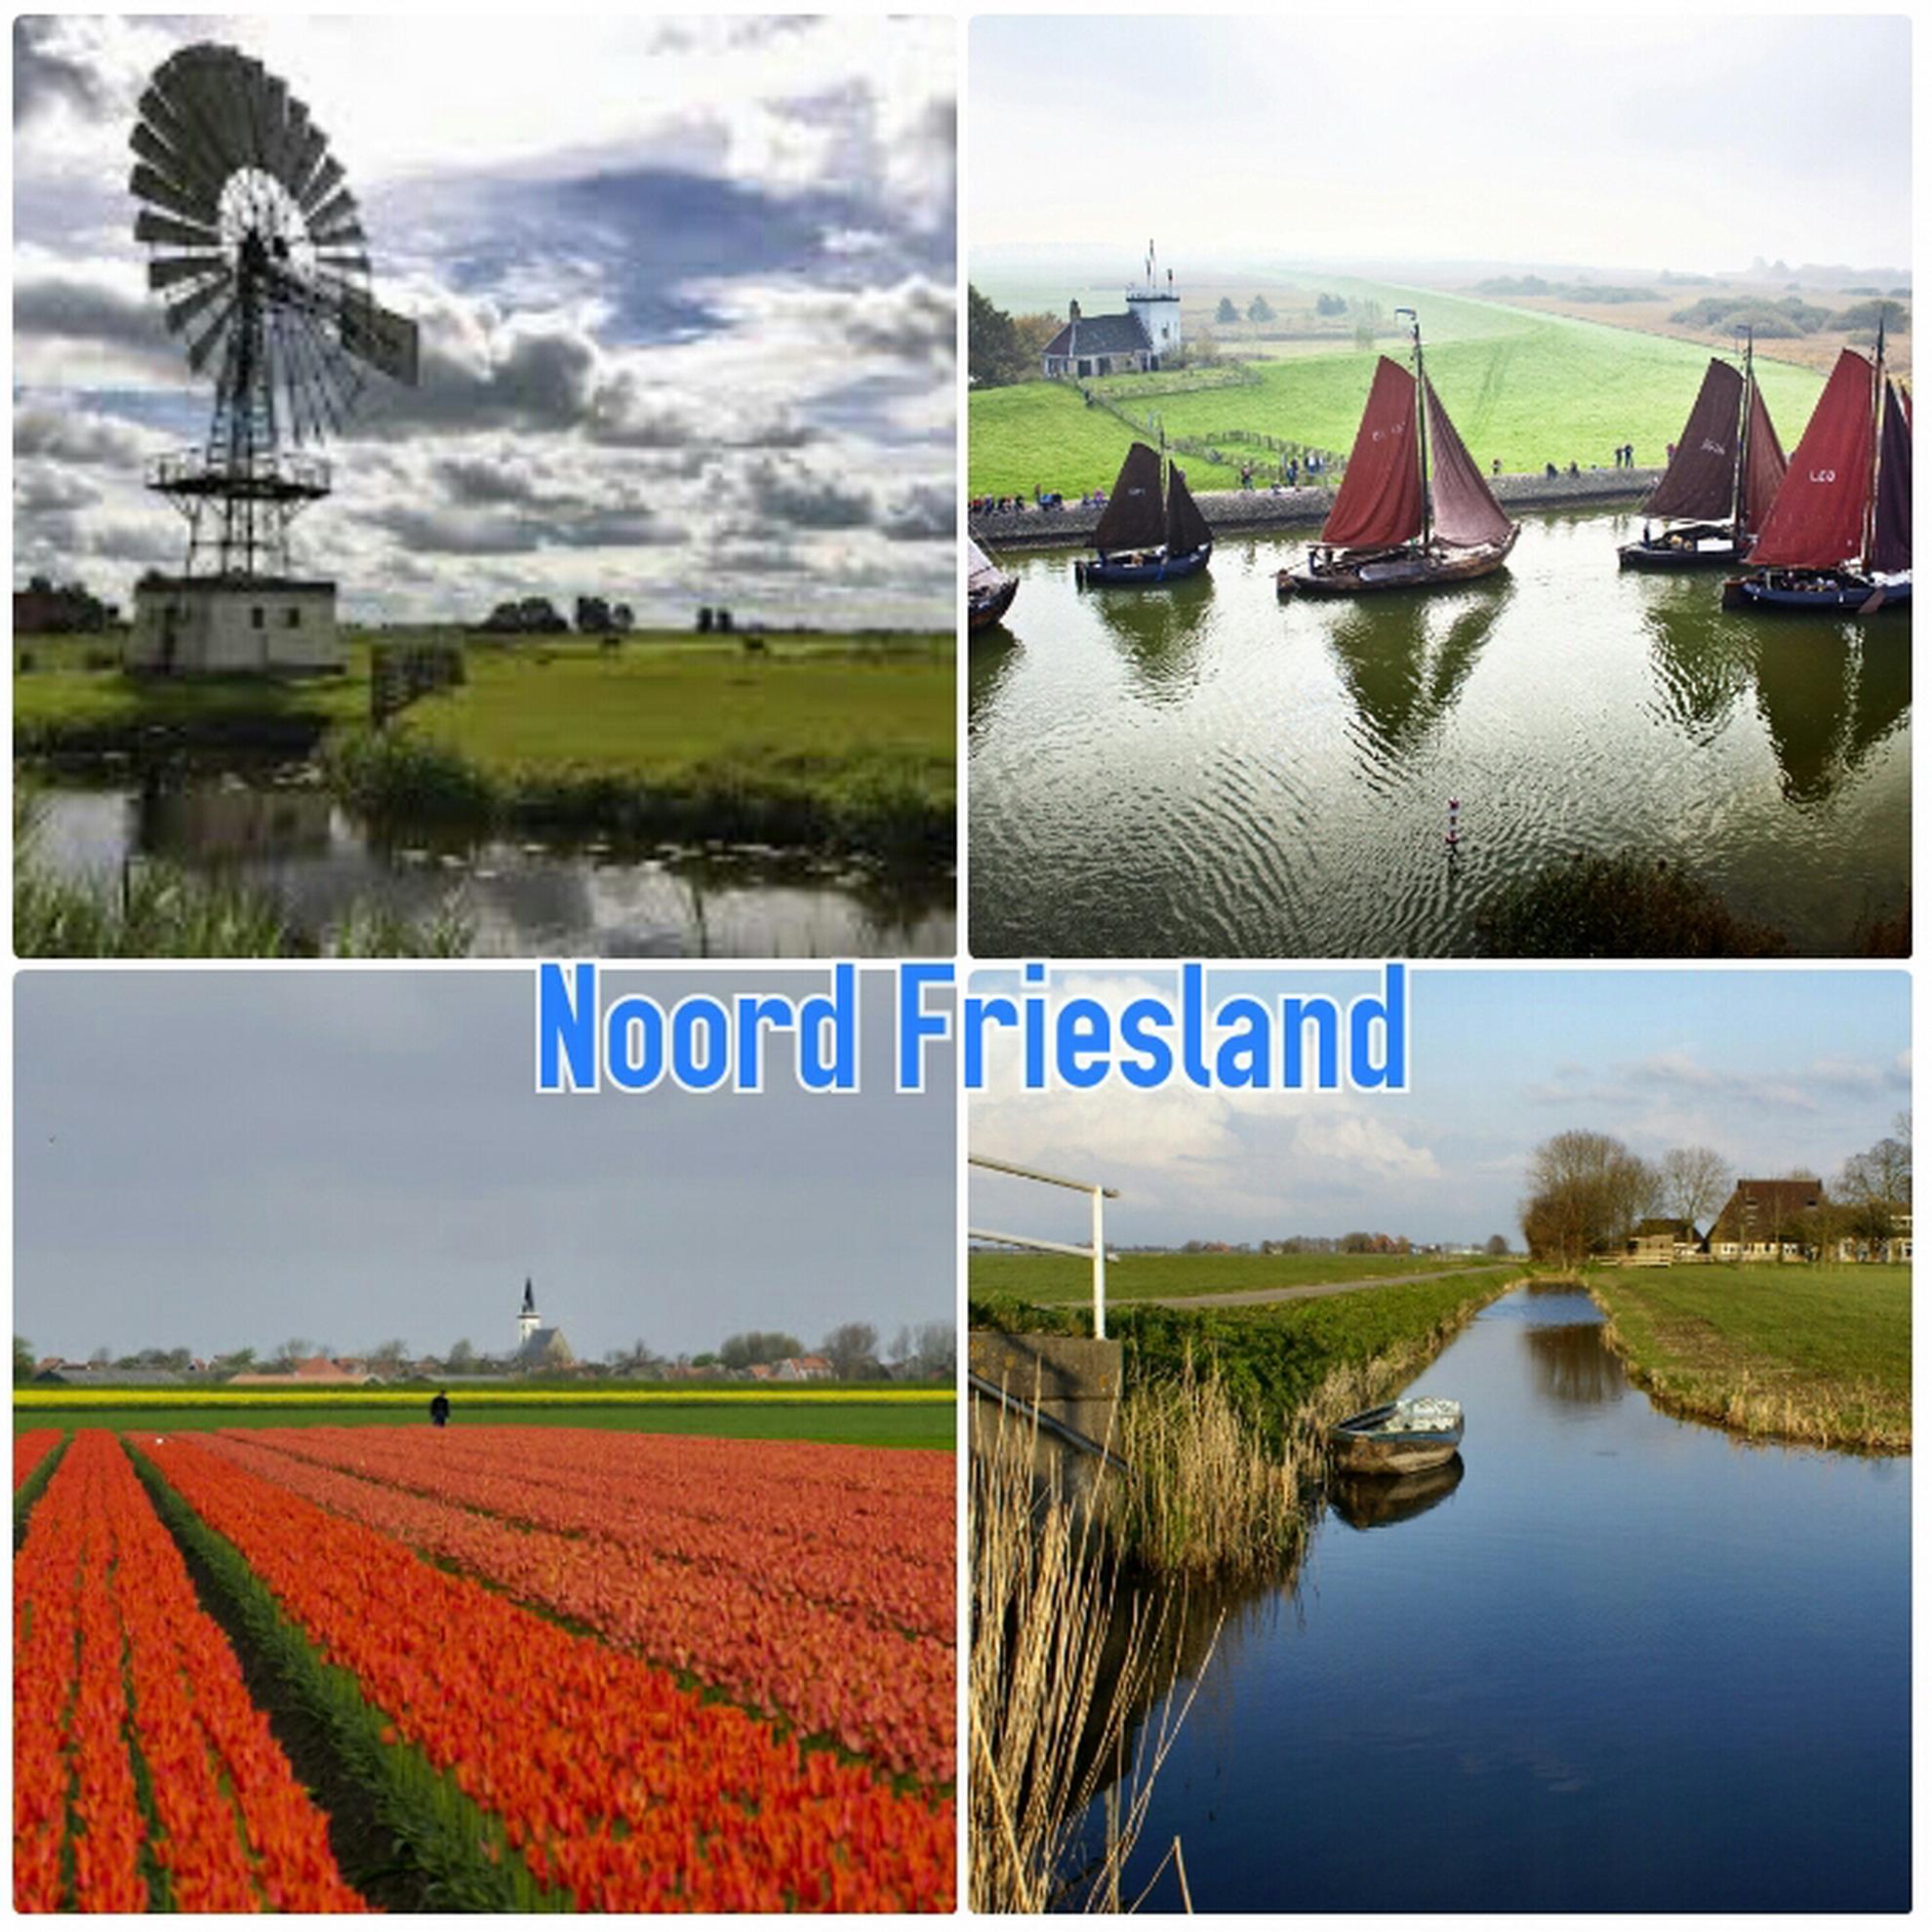 inwoners friesland 2006